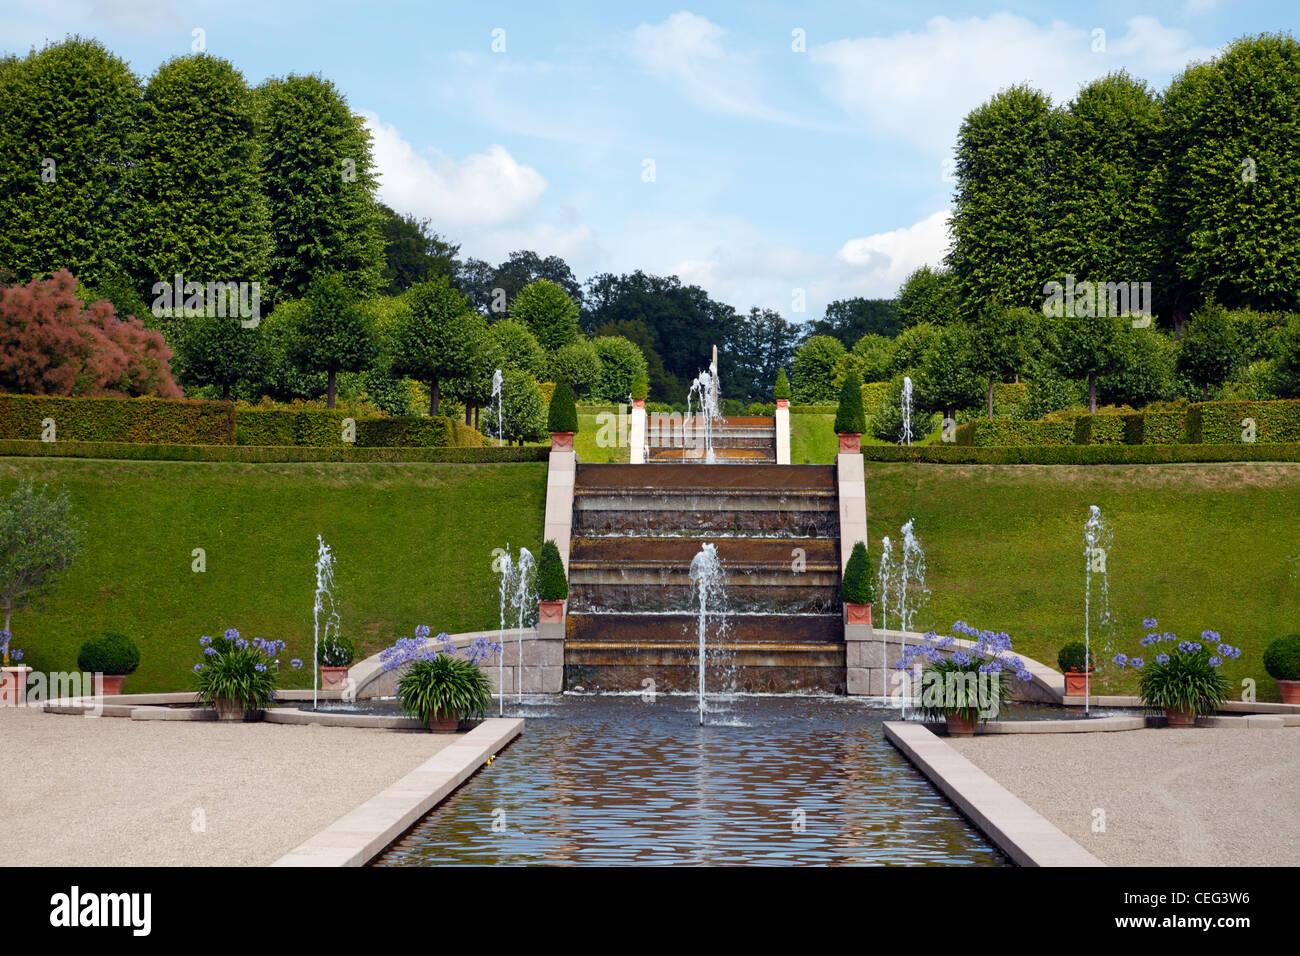 The cascade in The Baroque Garden at The Frederiksborg Castle in Hillerød, Denmark - Stock Image